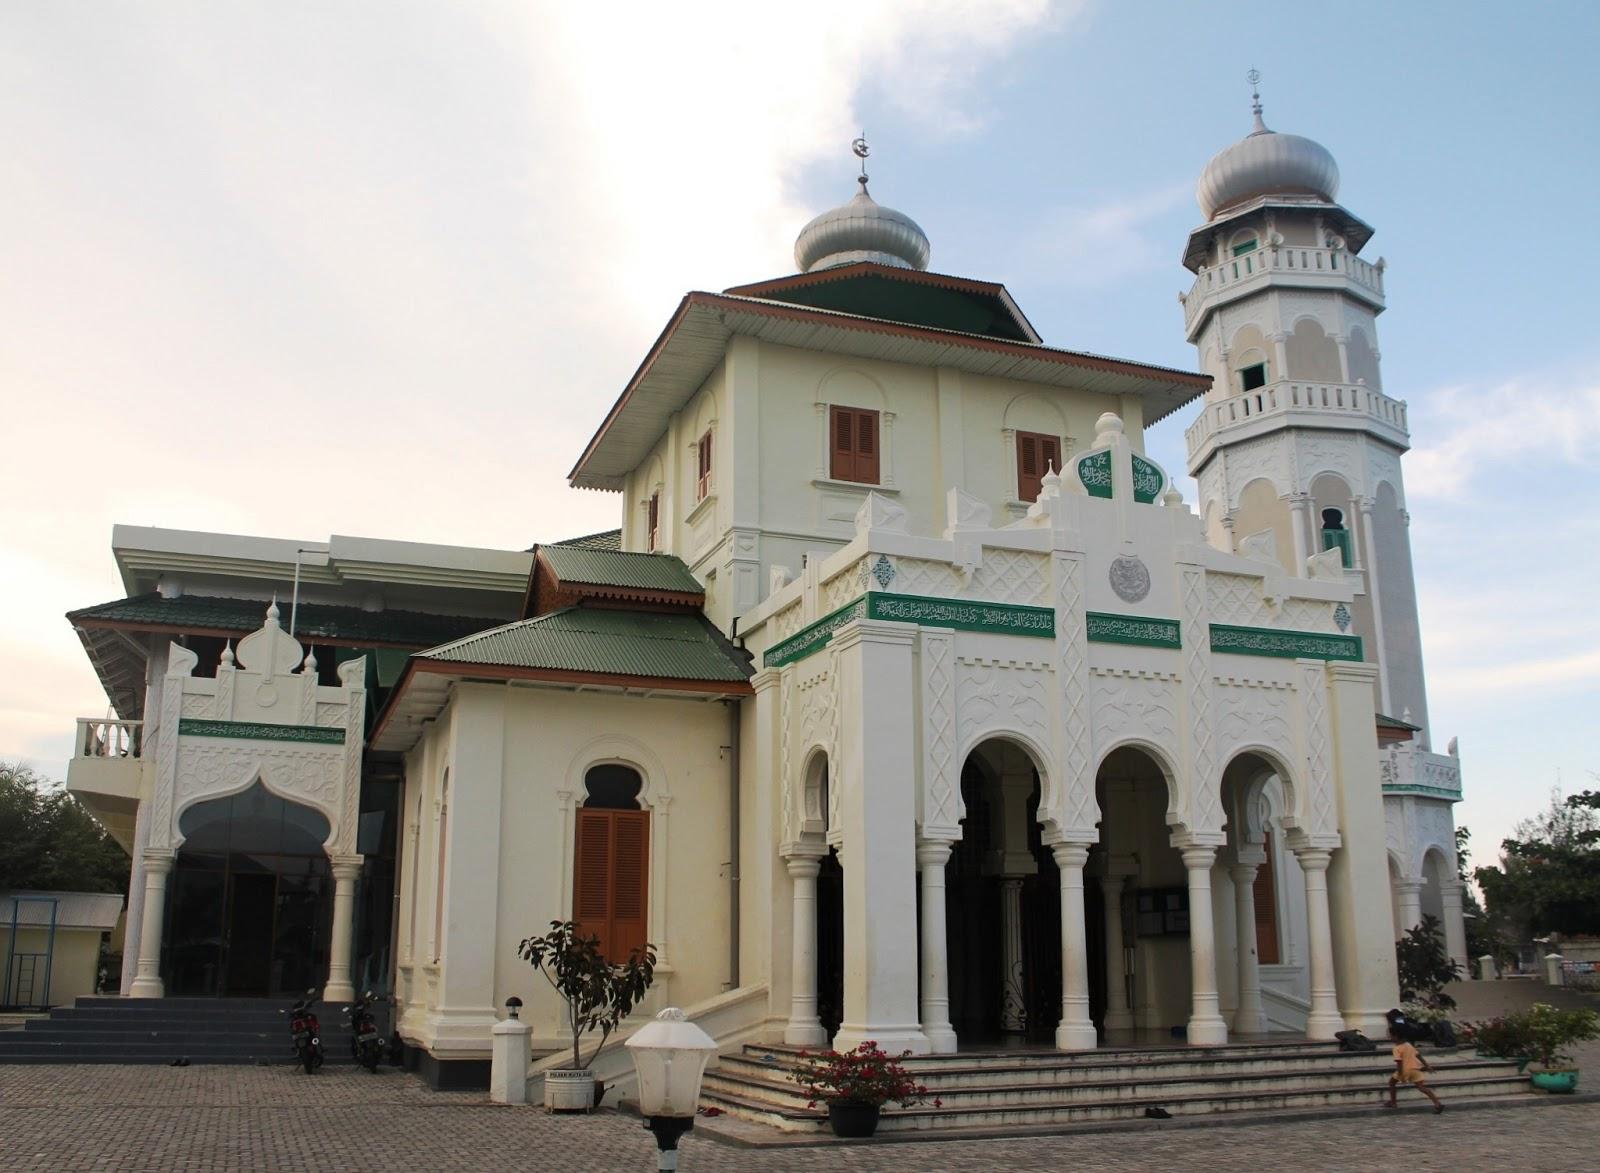 Masjid Baiturrahim Ulee Lheue Hunting Photography Architecture Kota Banda Aceh